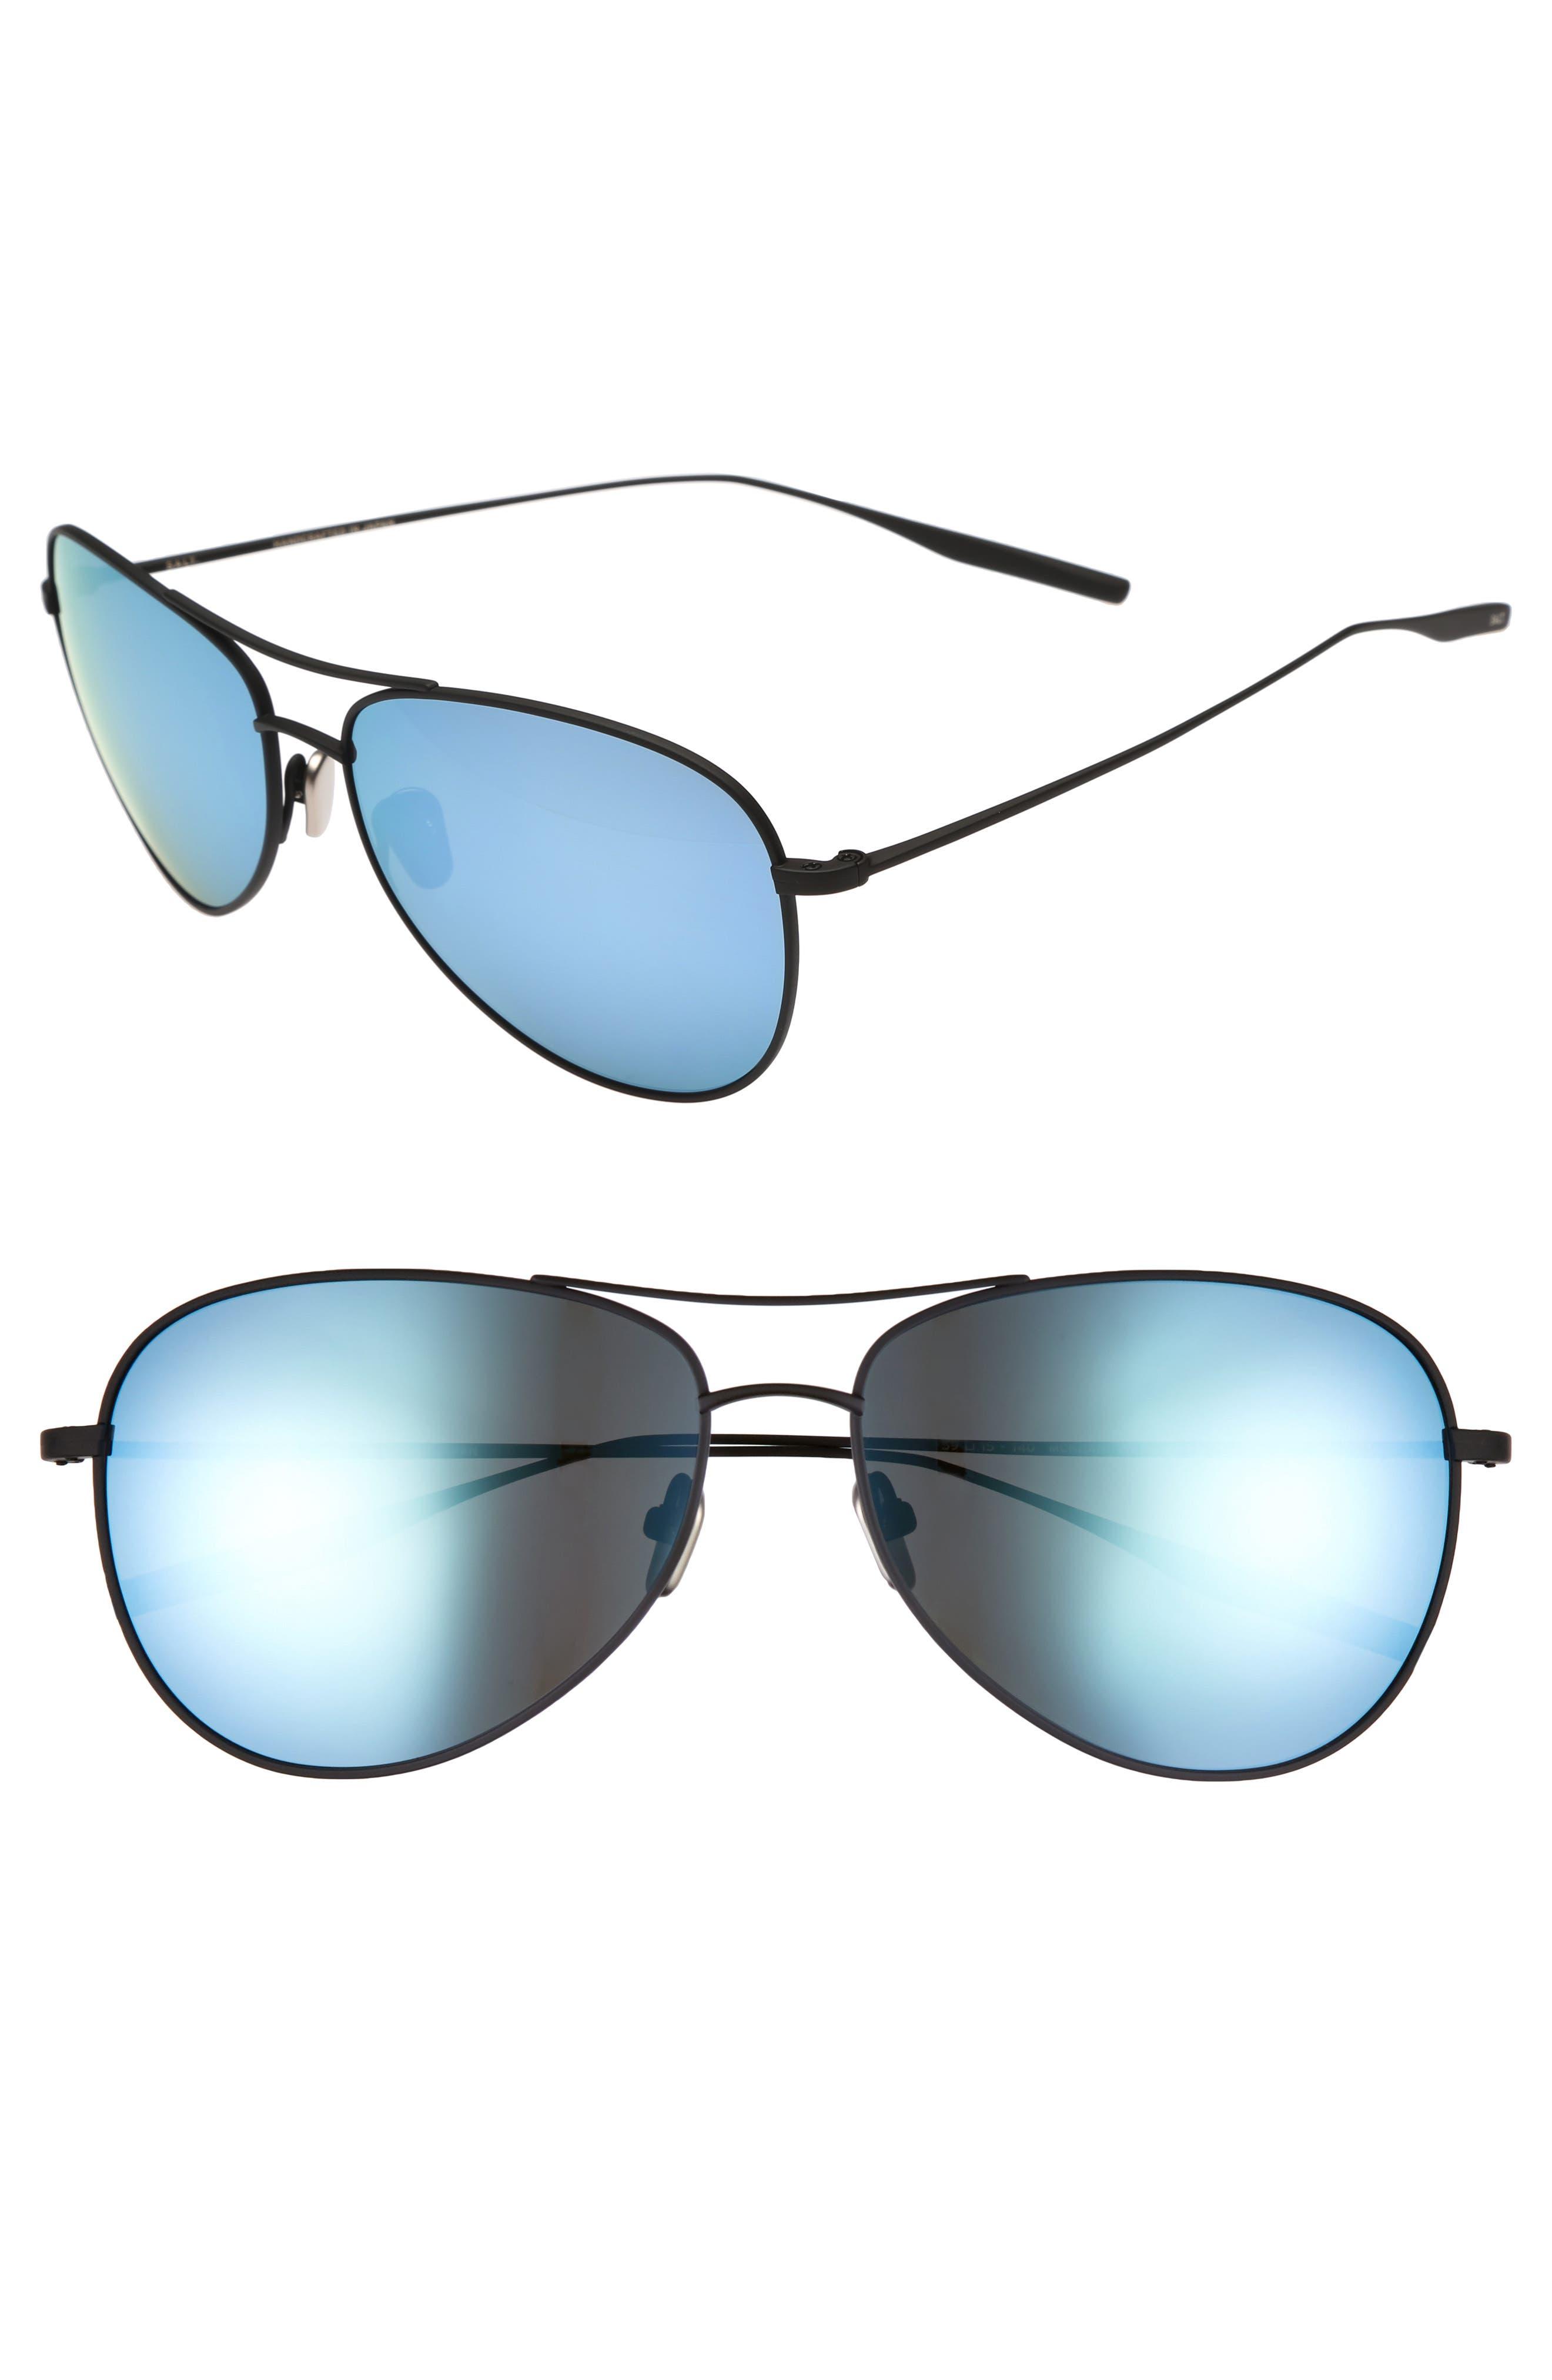 McKean 59mm Aviator Sunglasses,                             Main thumbnail 1, color,                             Black Sand / Mirror Blue